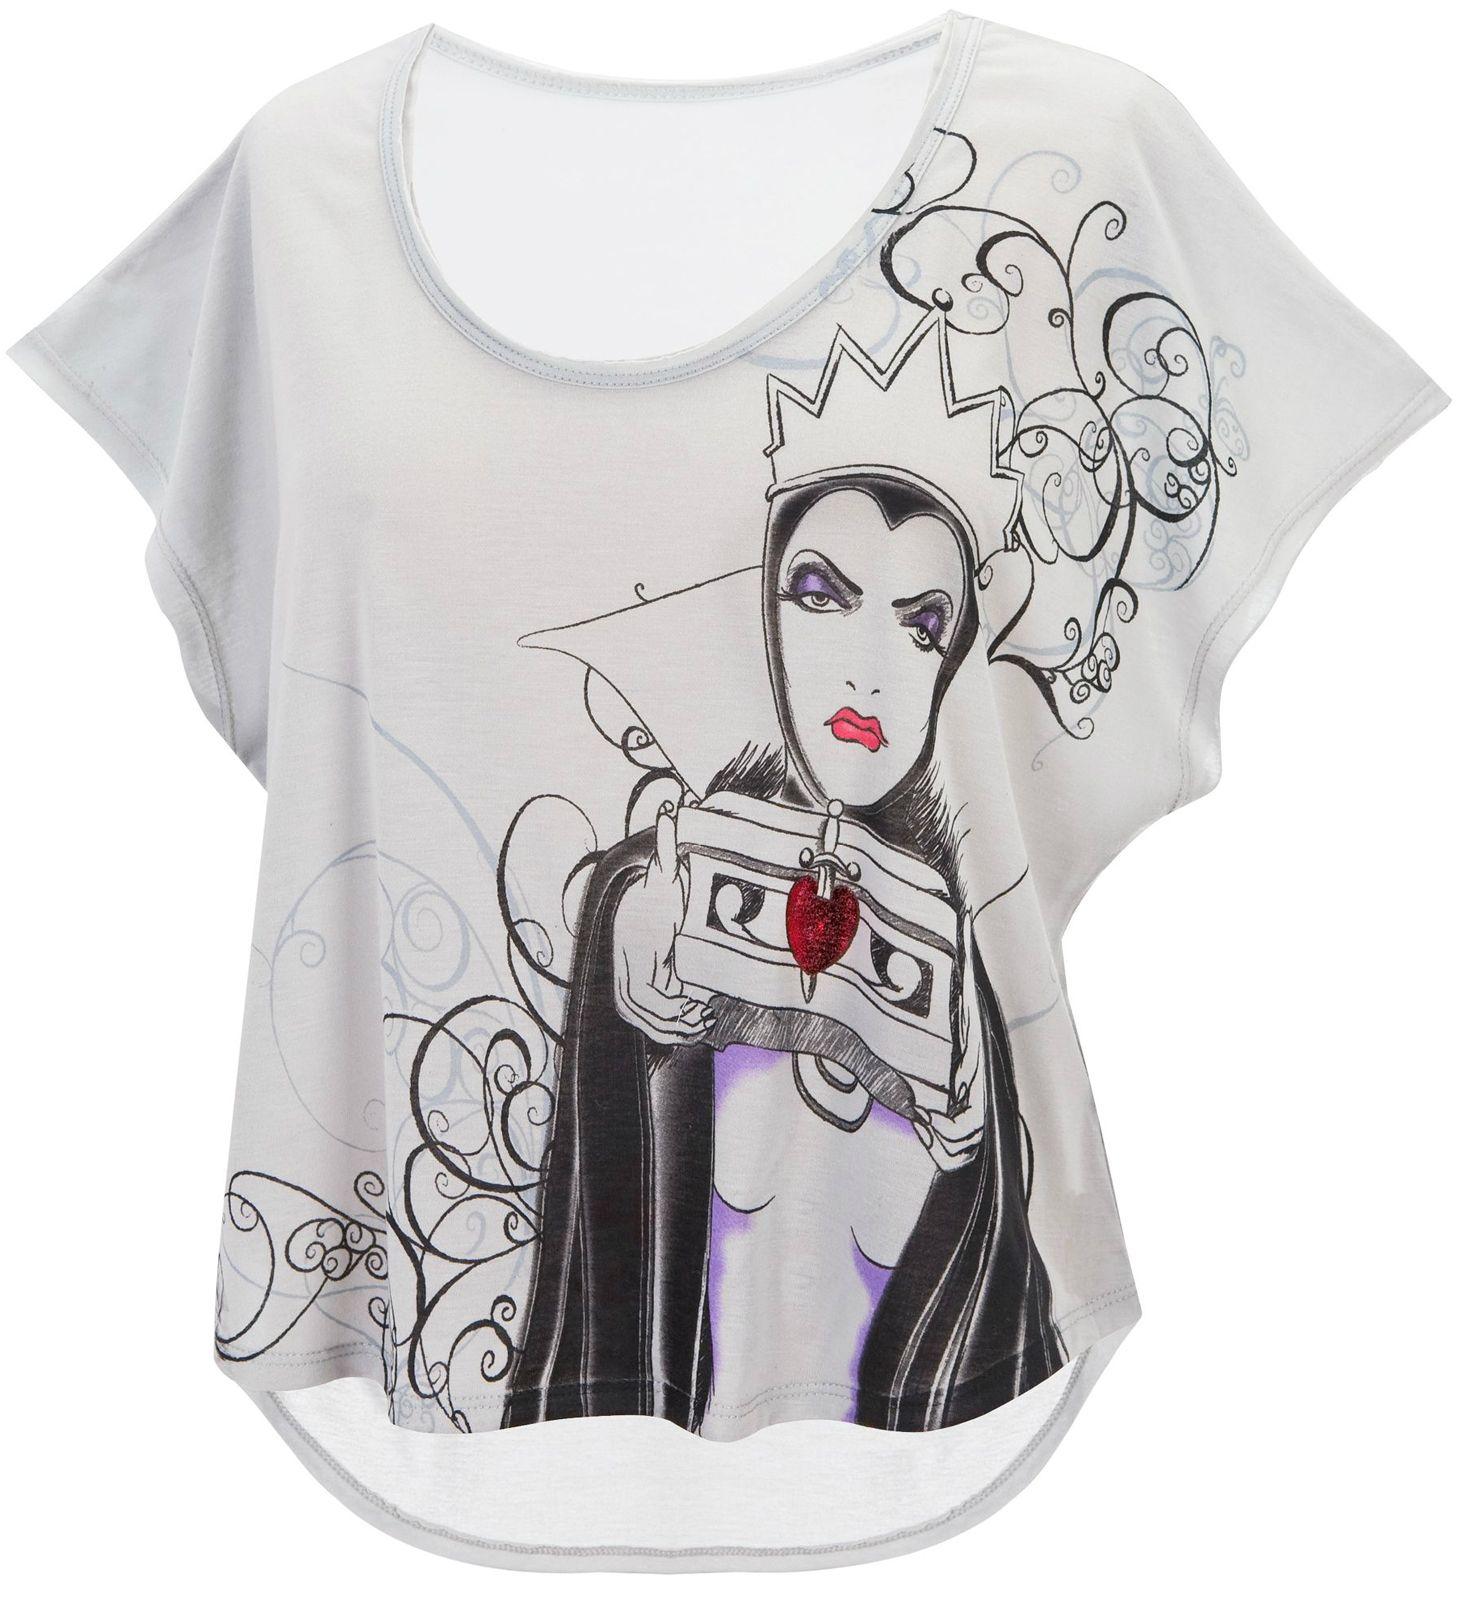 evil queen - Buscar con Google   Disney   Clothes, Disney ...Disney Evil Queen T Shirt